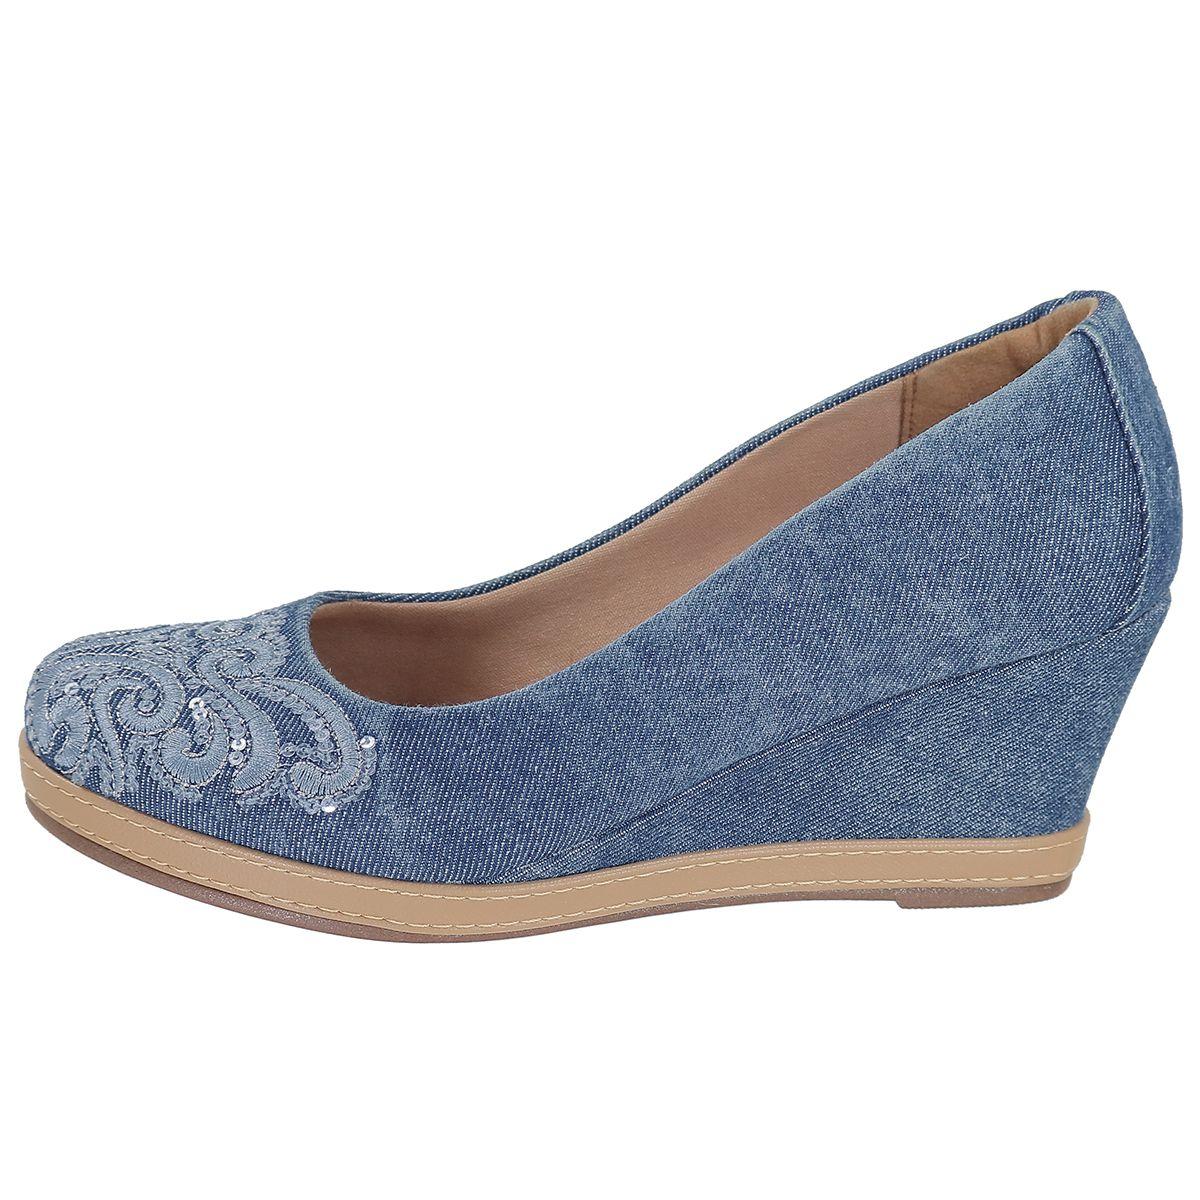 fe4b857c38 Sapato Scarpin Feminino Anabela Jeans